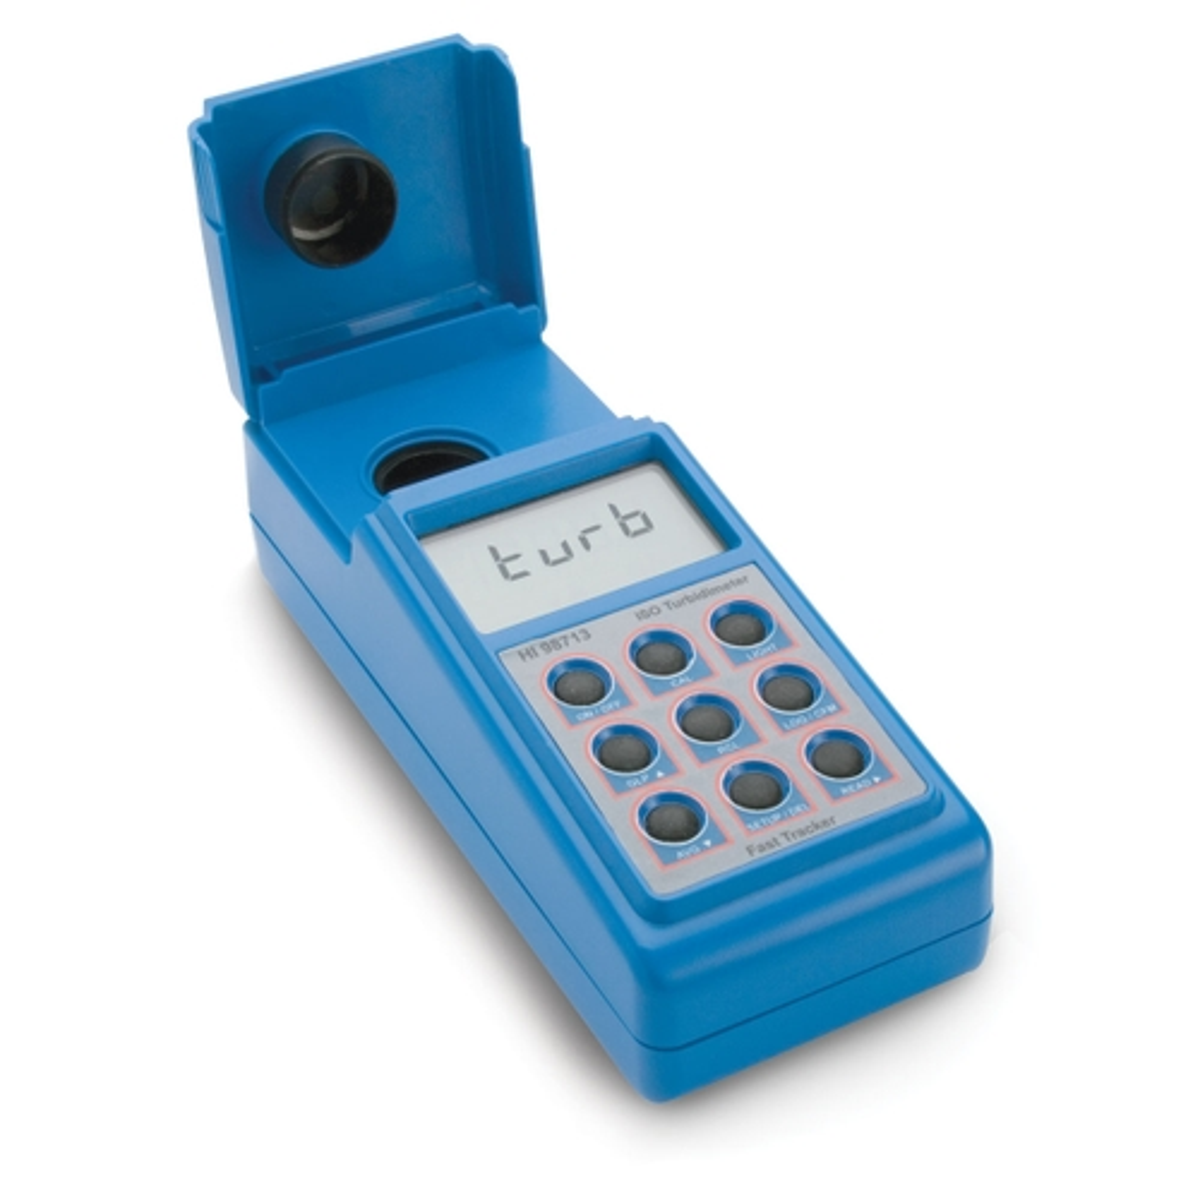 HI98713 - Turbidimetro portatile conforme allo standard ISO